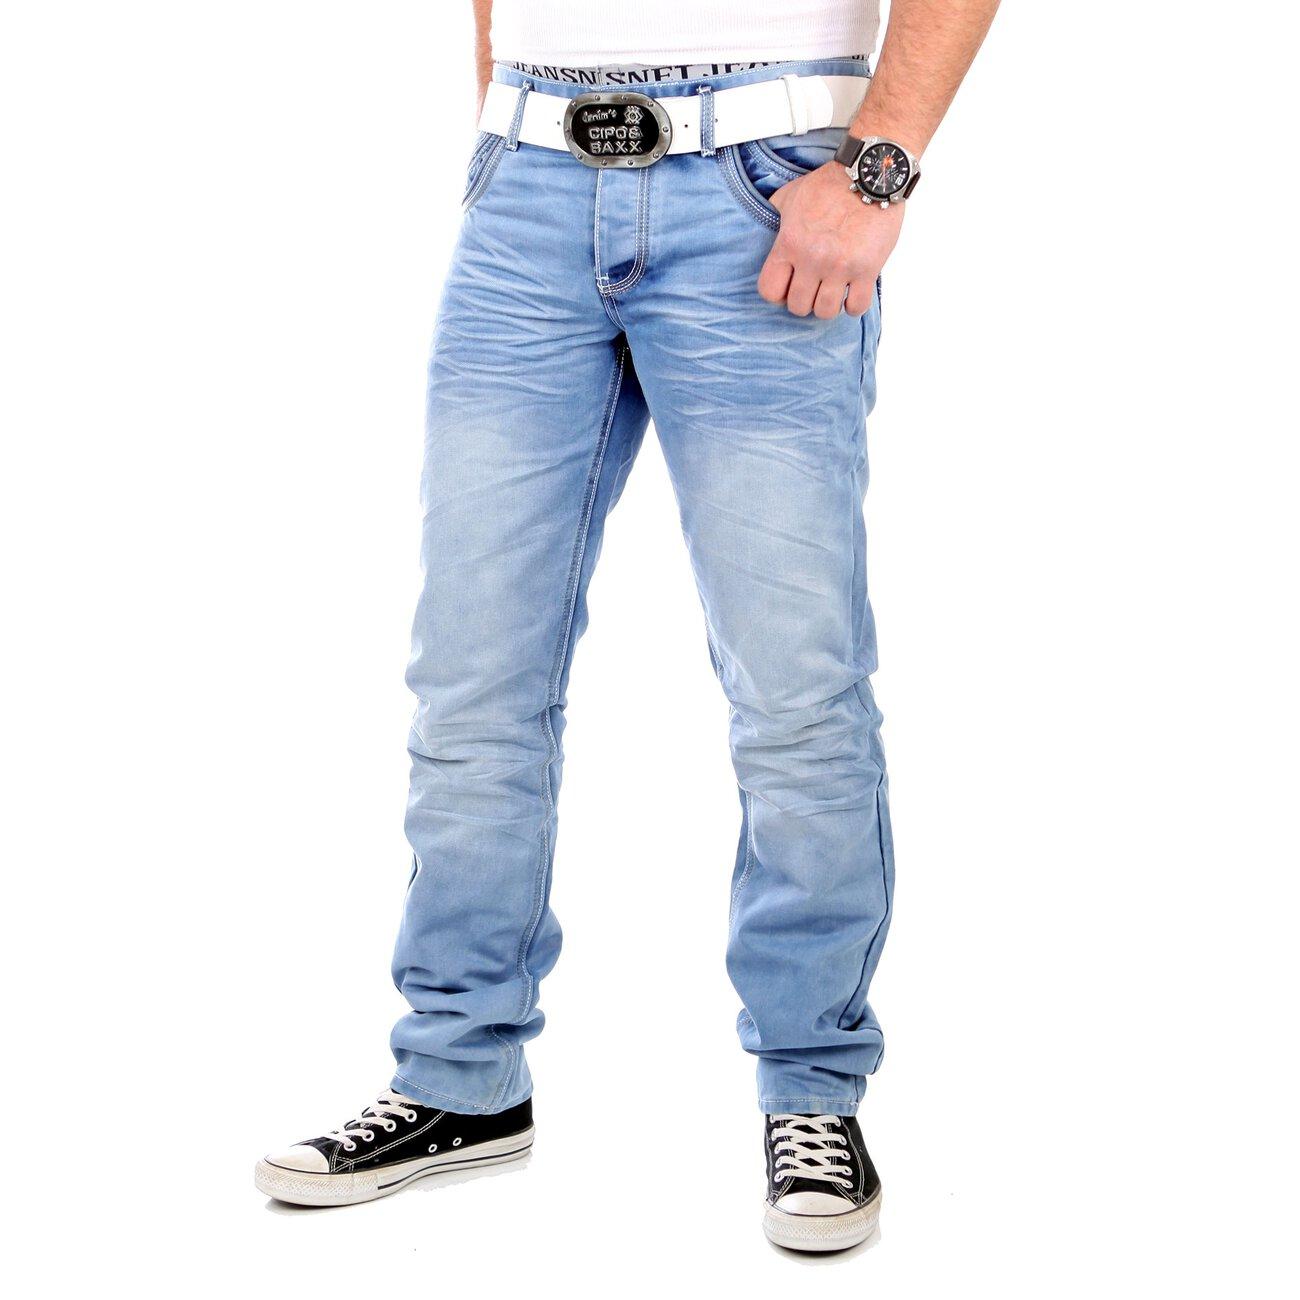 reslad jeans herren straight fit used look jeanshose hellblau. Black Bedroom Furniture Sets. Home Design Ideas